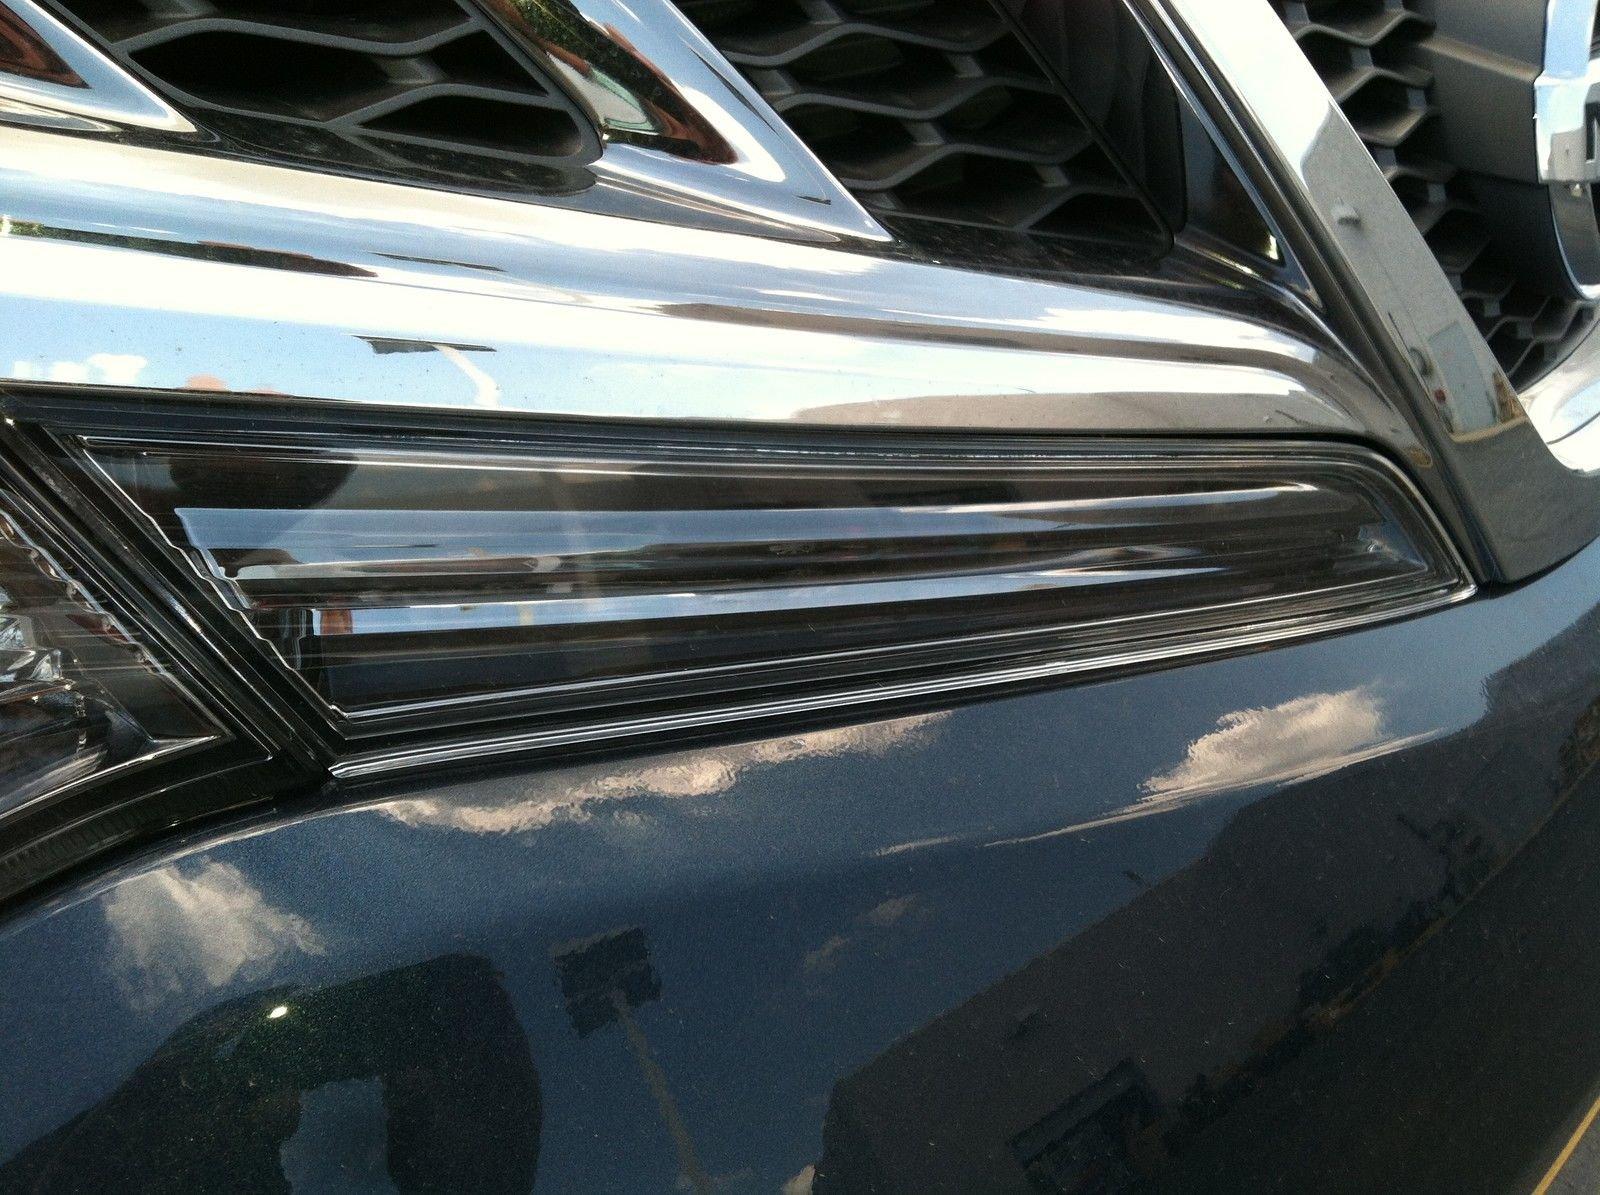 NEW OEM 2009-2014 NISSAN MURANO HEADLIGHT REFLECTOR PANEL - PASSENGER SIDE by Nissan